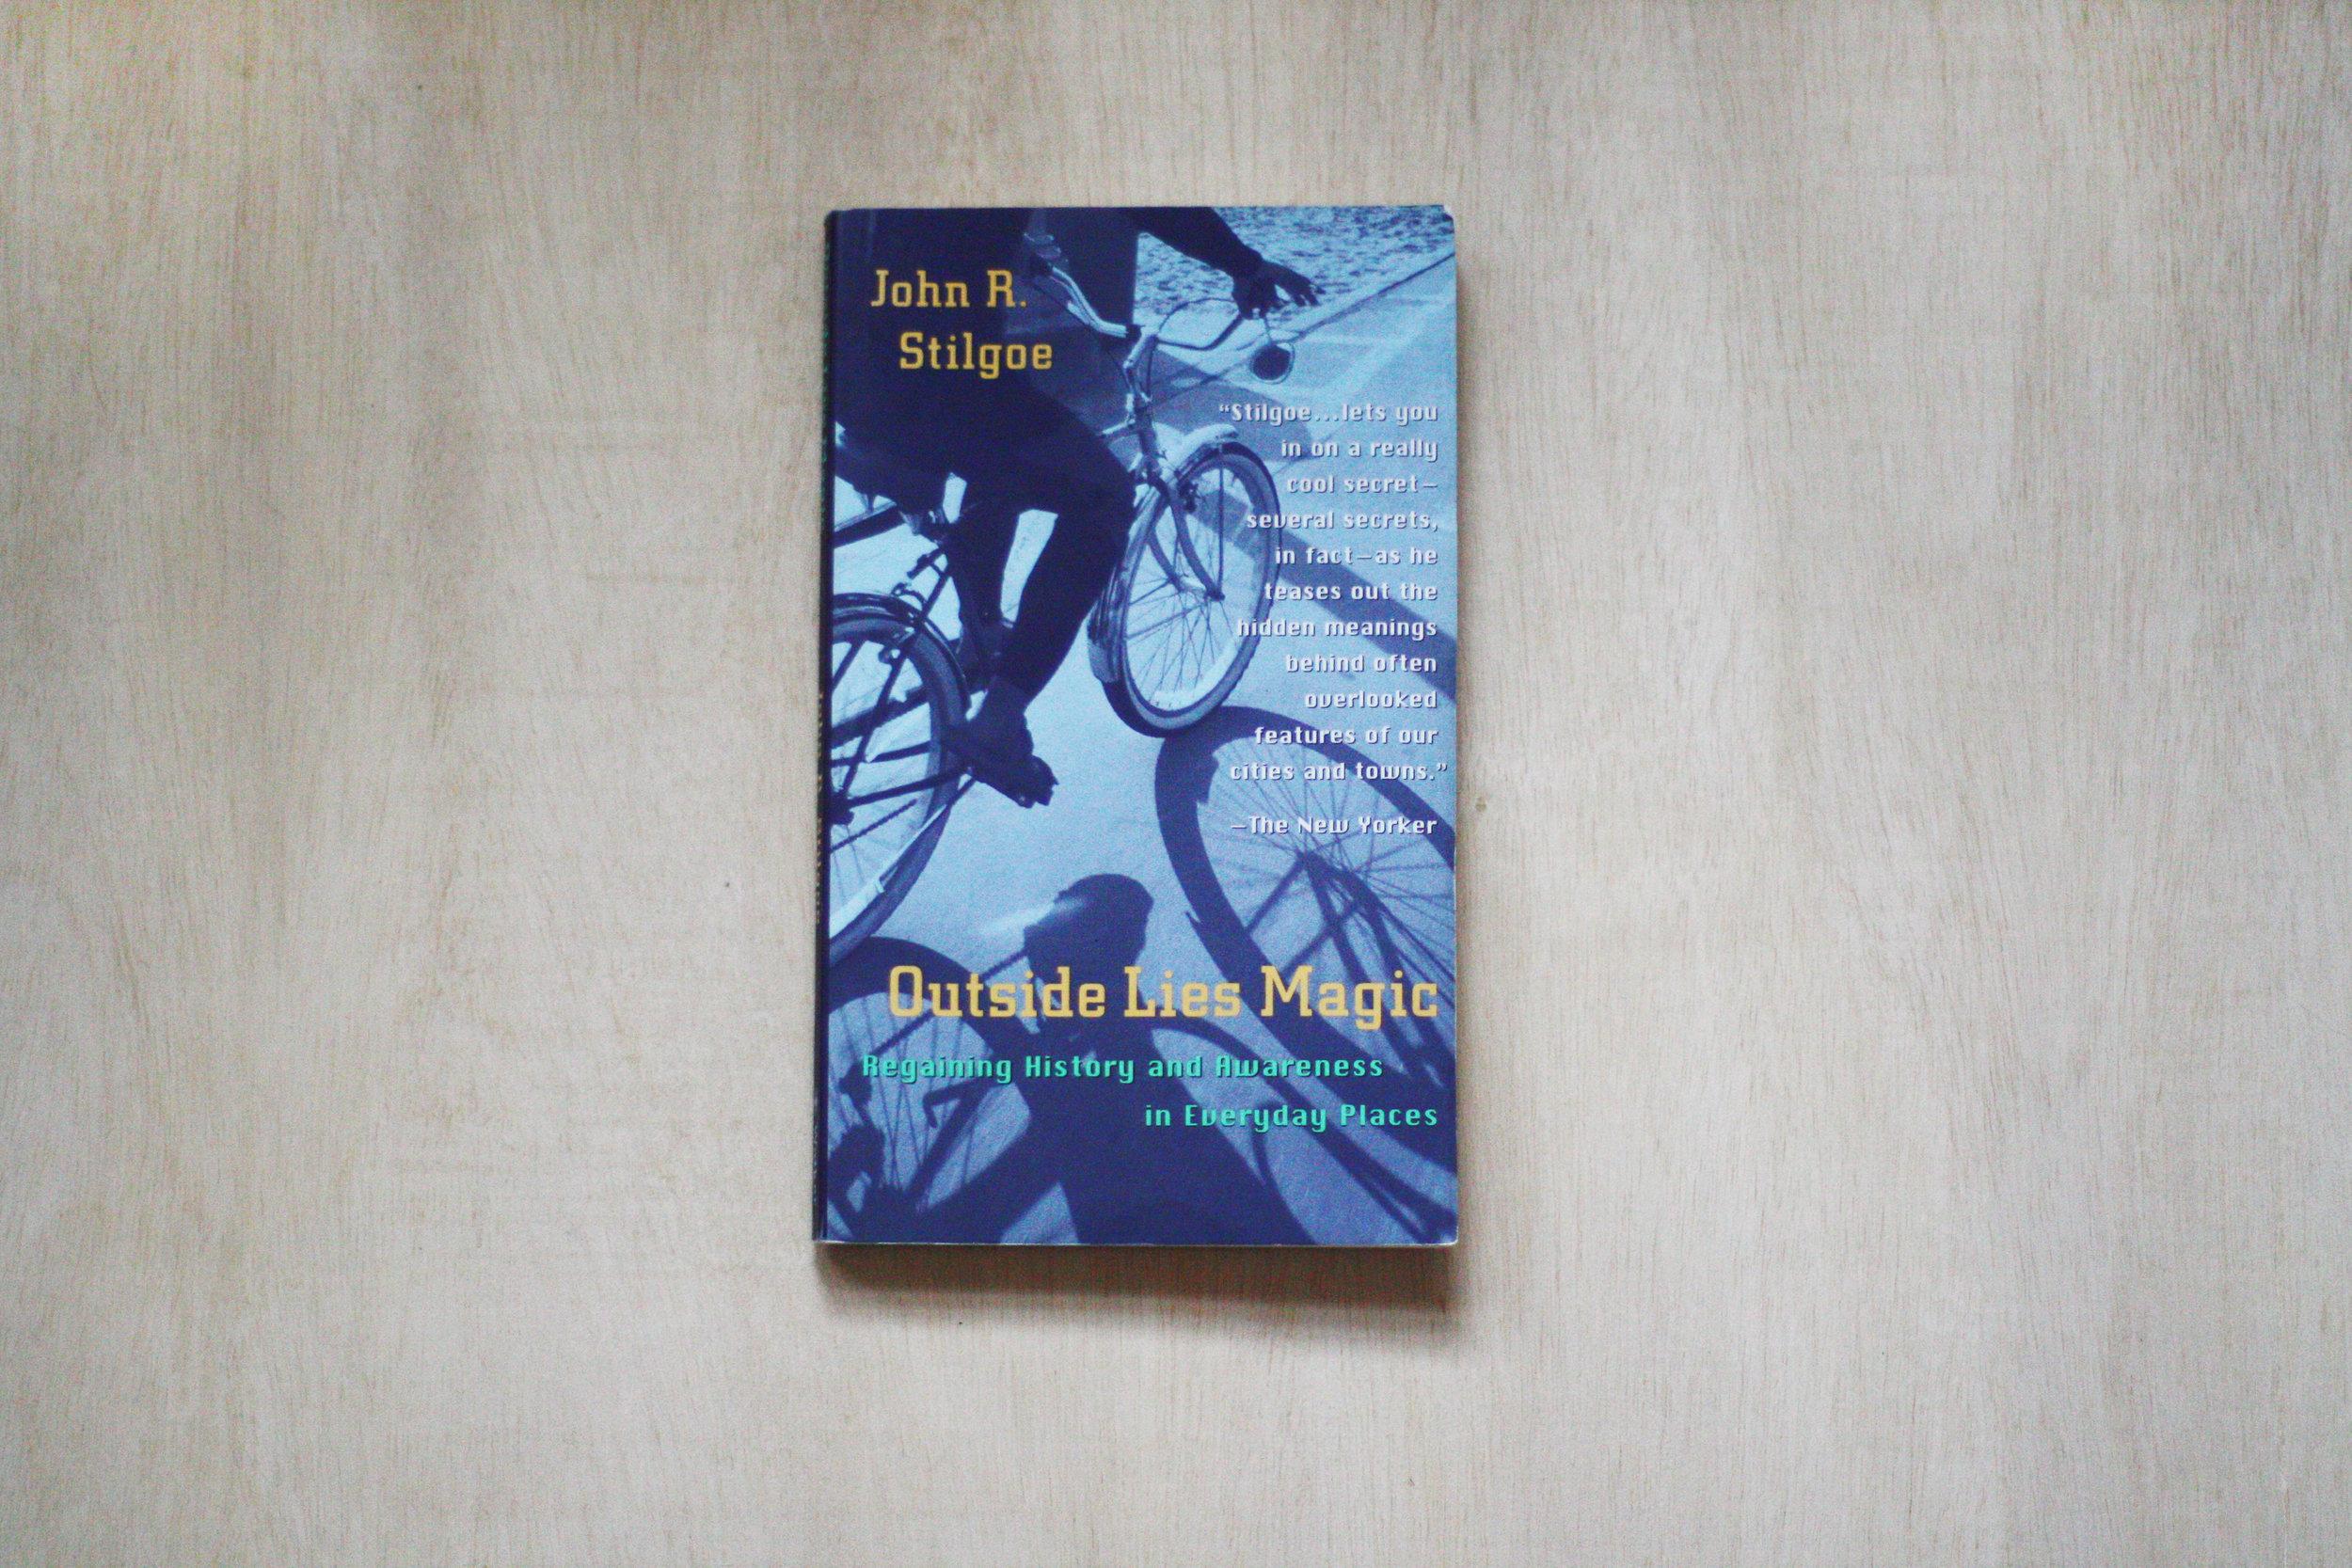 Outside Lies Magic , Chapter 1: Beginnings